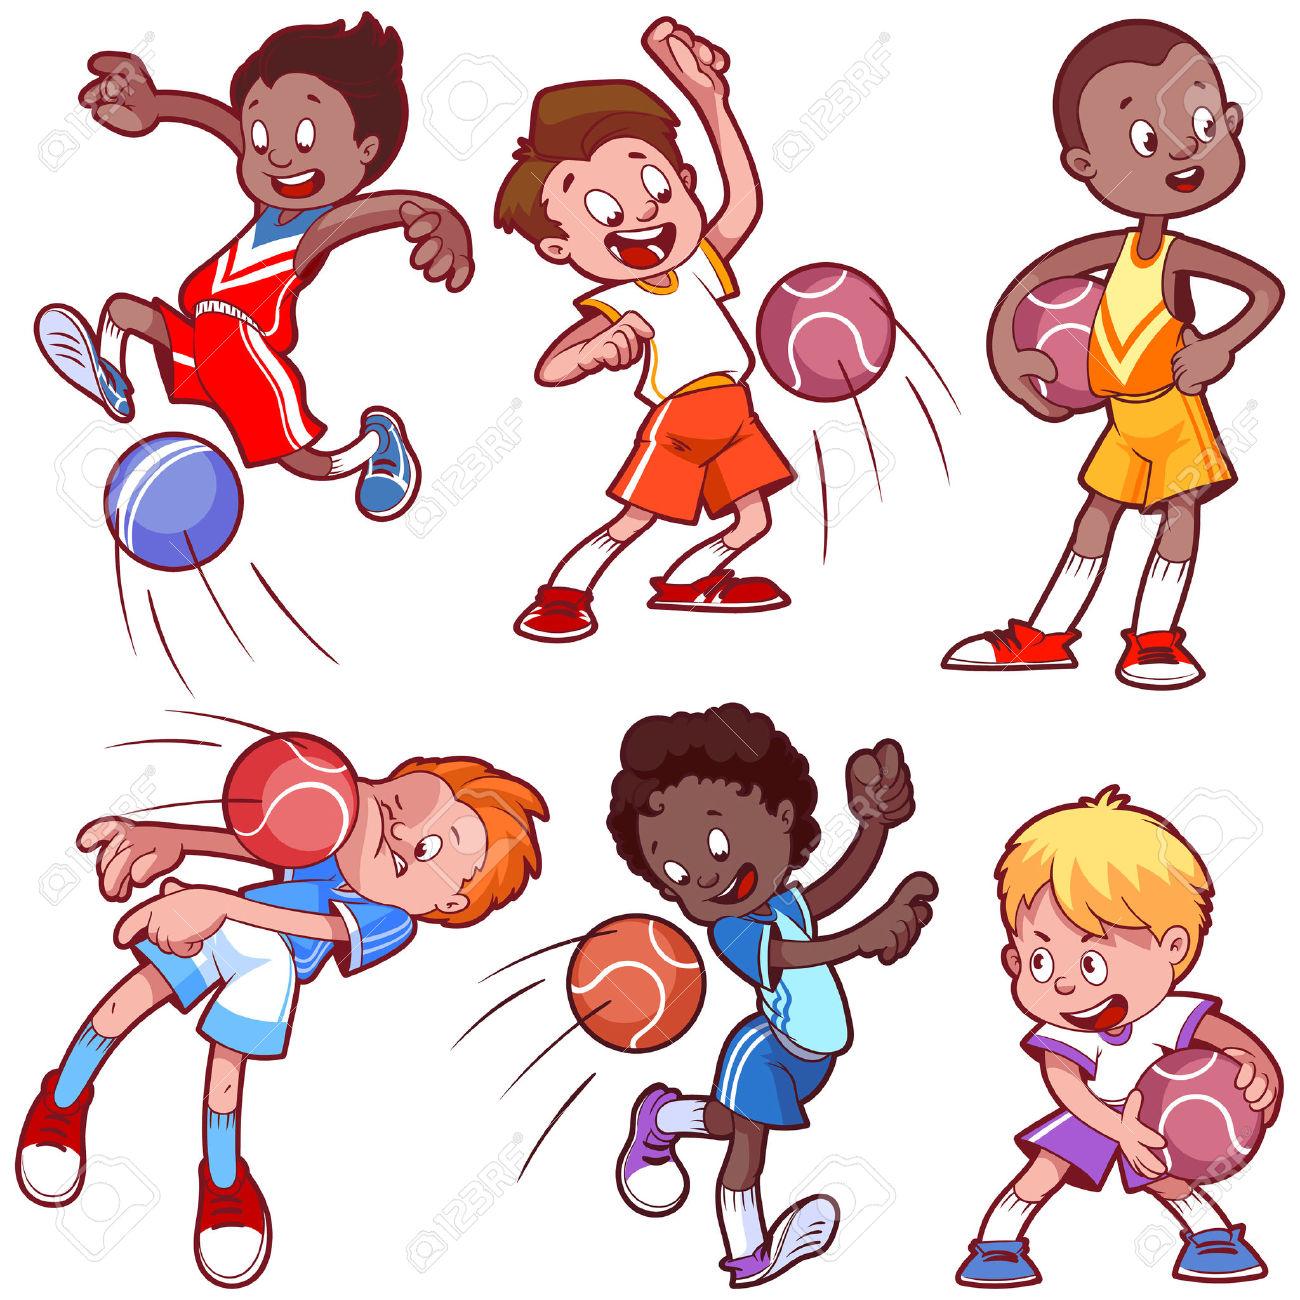 dodge ball clipart clipground kickball clipart free - google search kickball clipart black white